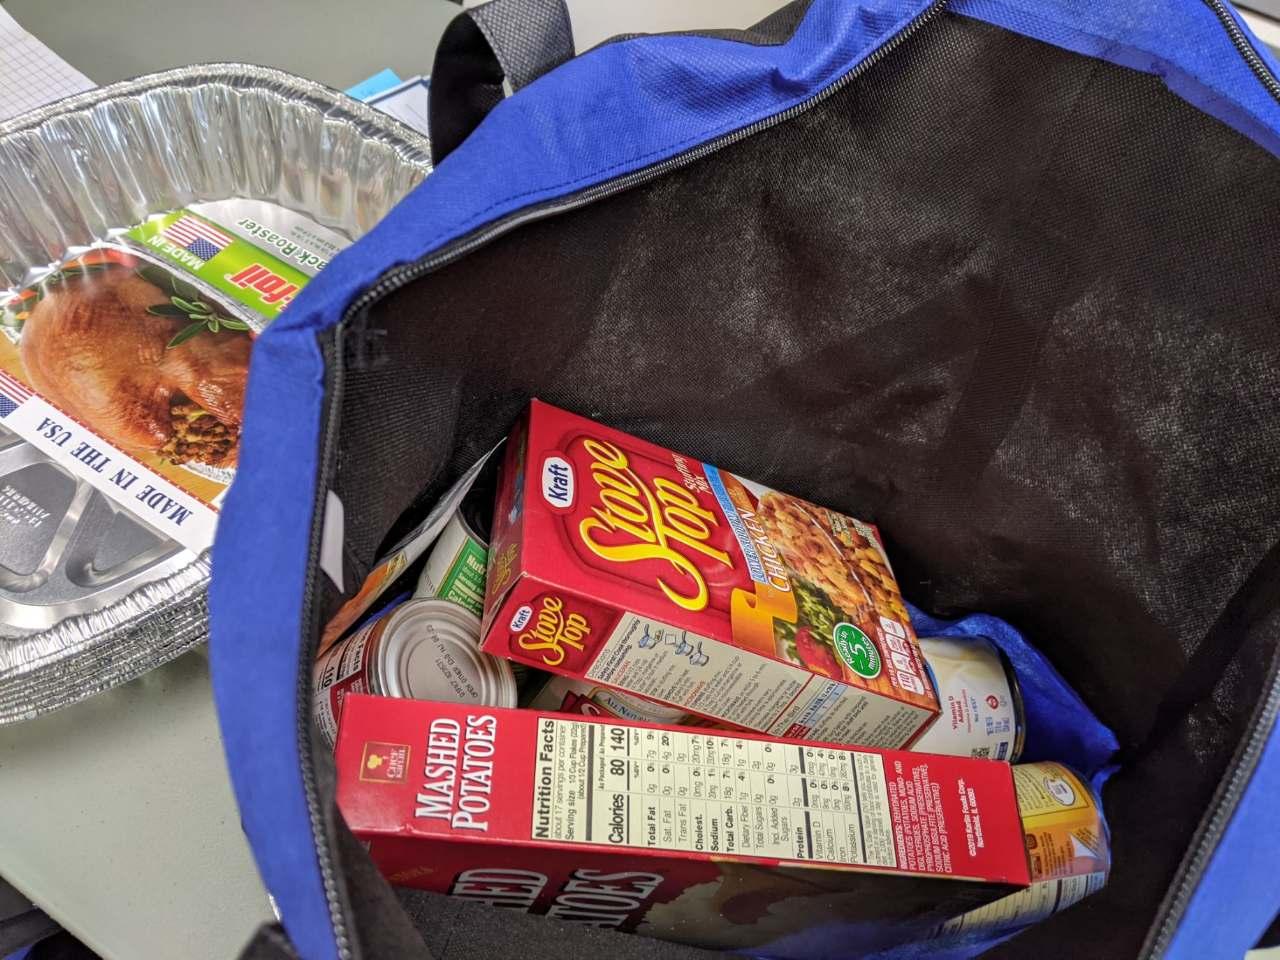 Stovetop stuffing boxes inside a bag for food shelf